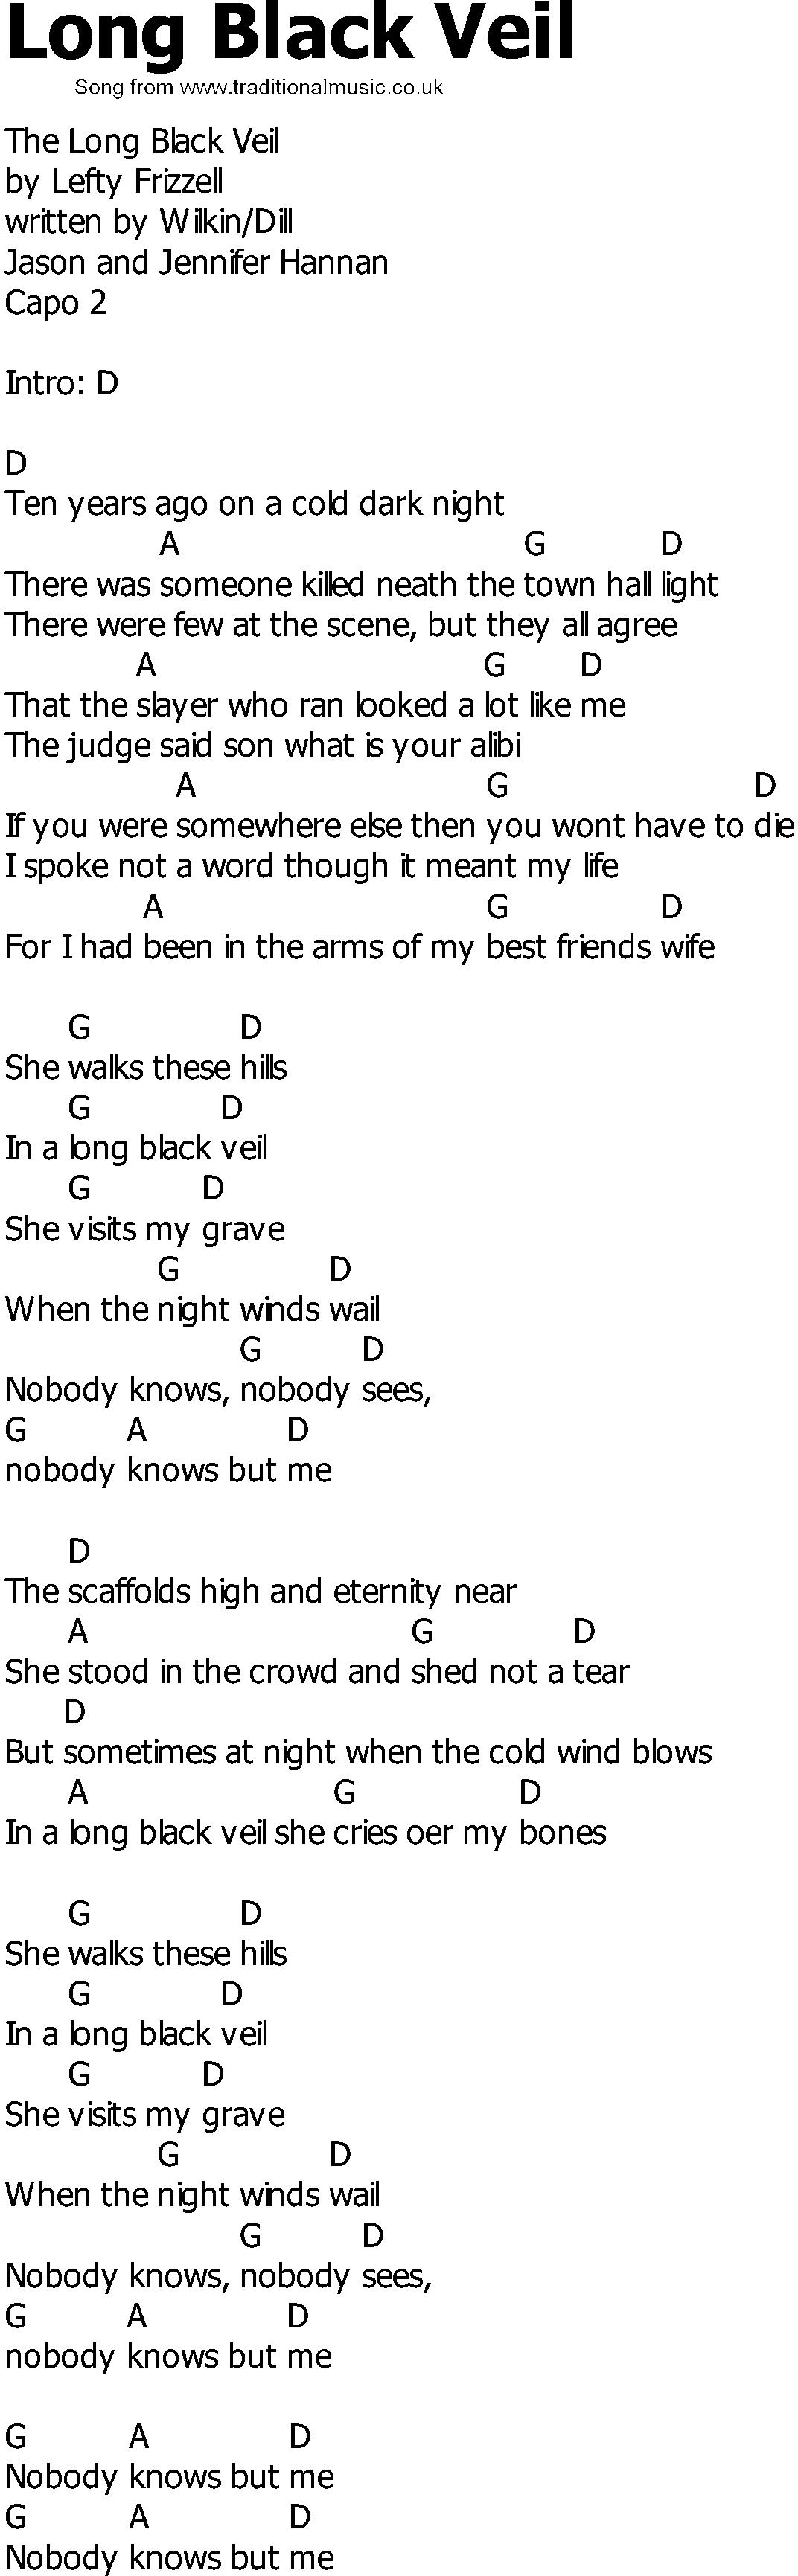 Old Country Song Lyrics With Chords Long Black Veil Country Songs Old Country Songs Country Song Lyrics